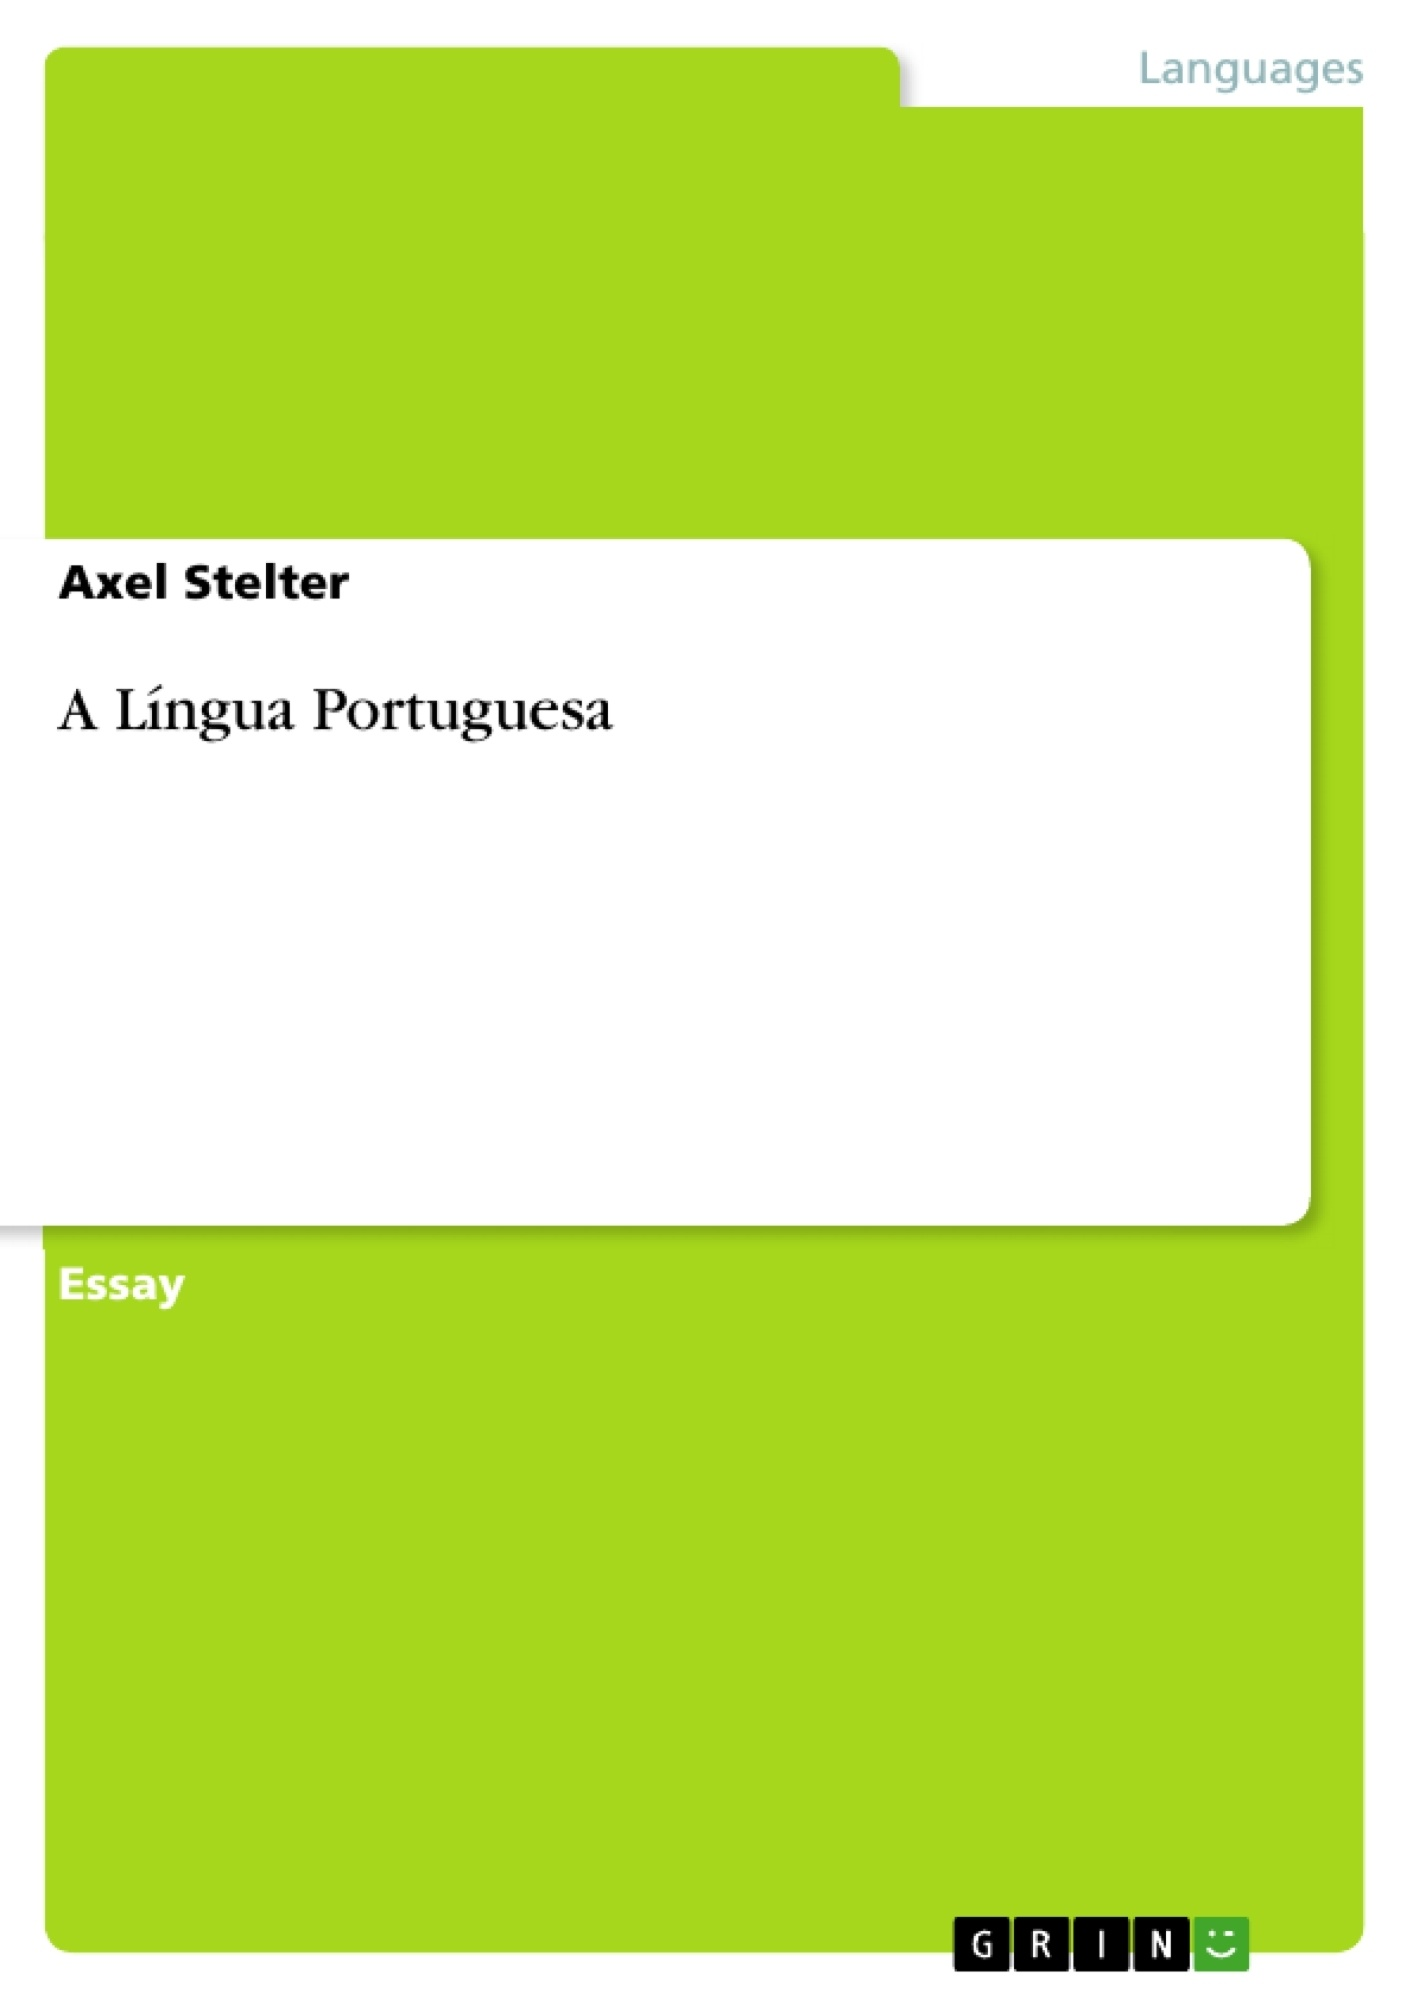 Title: A Língua Portuguesa